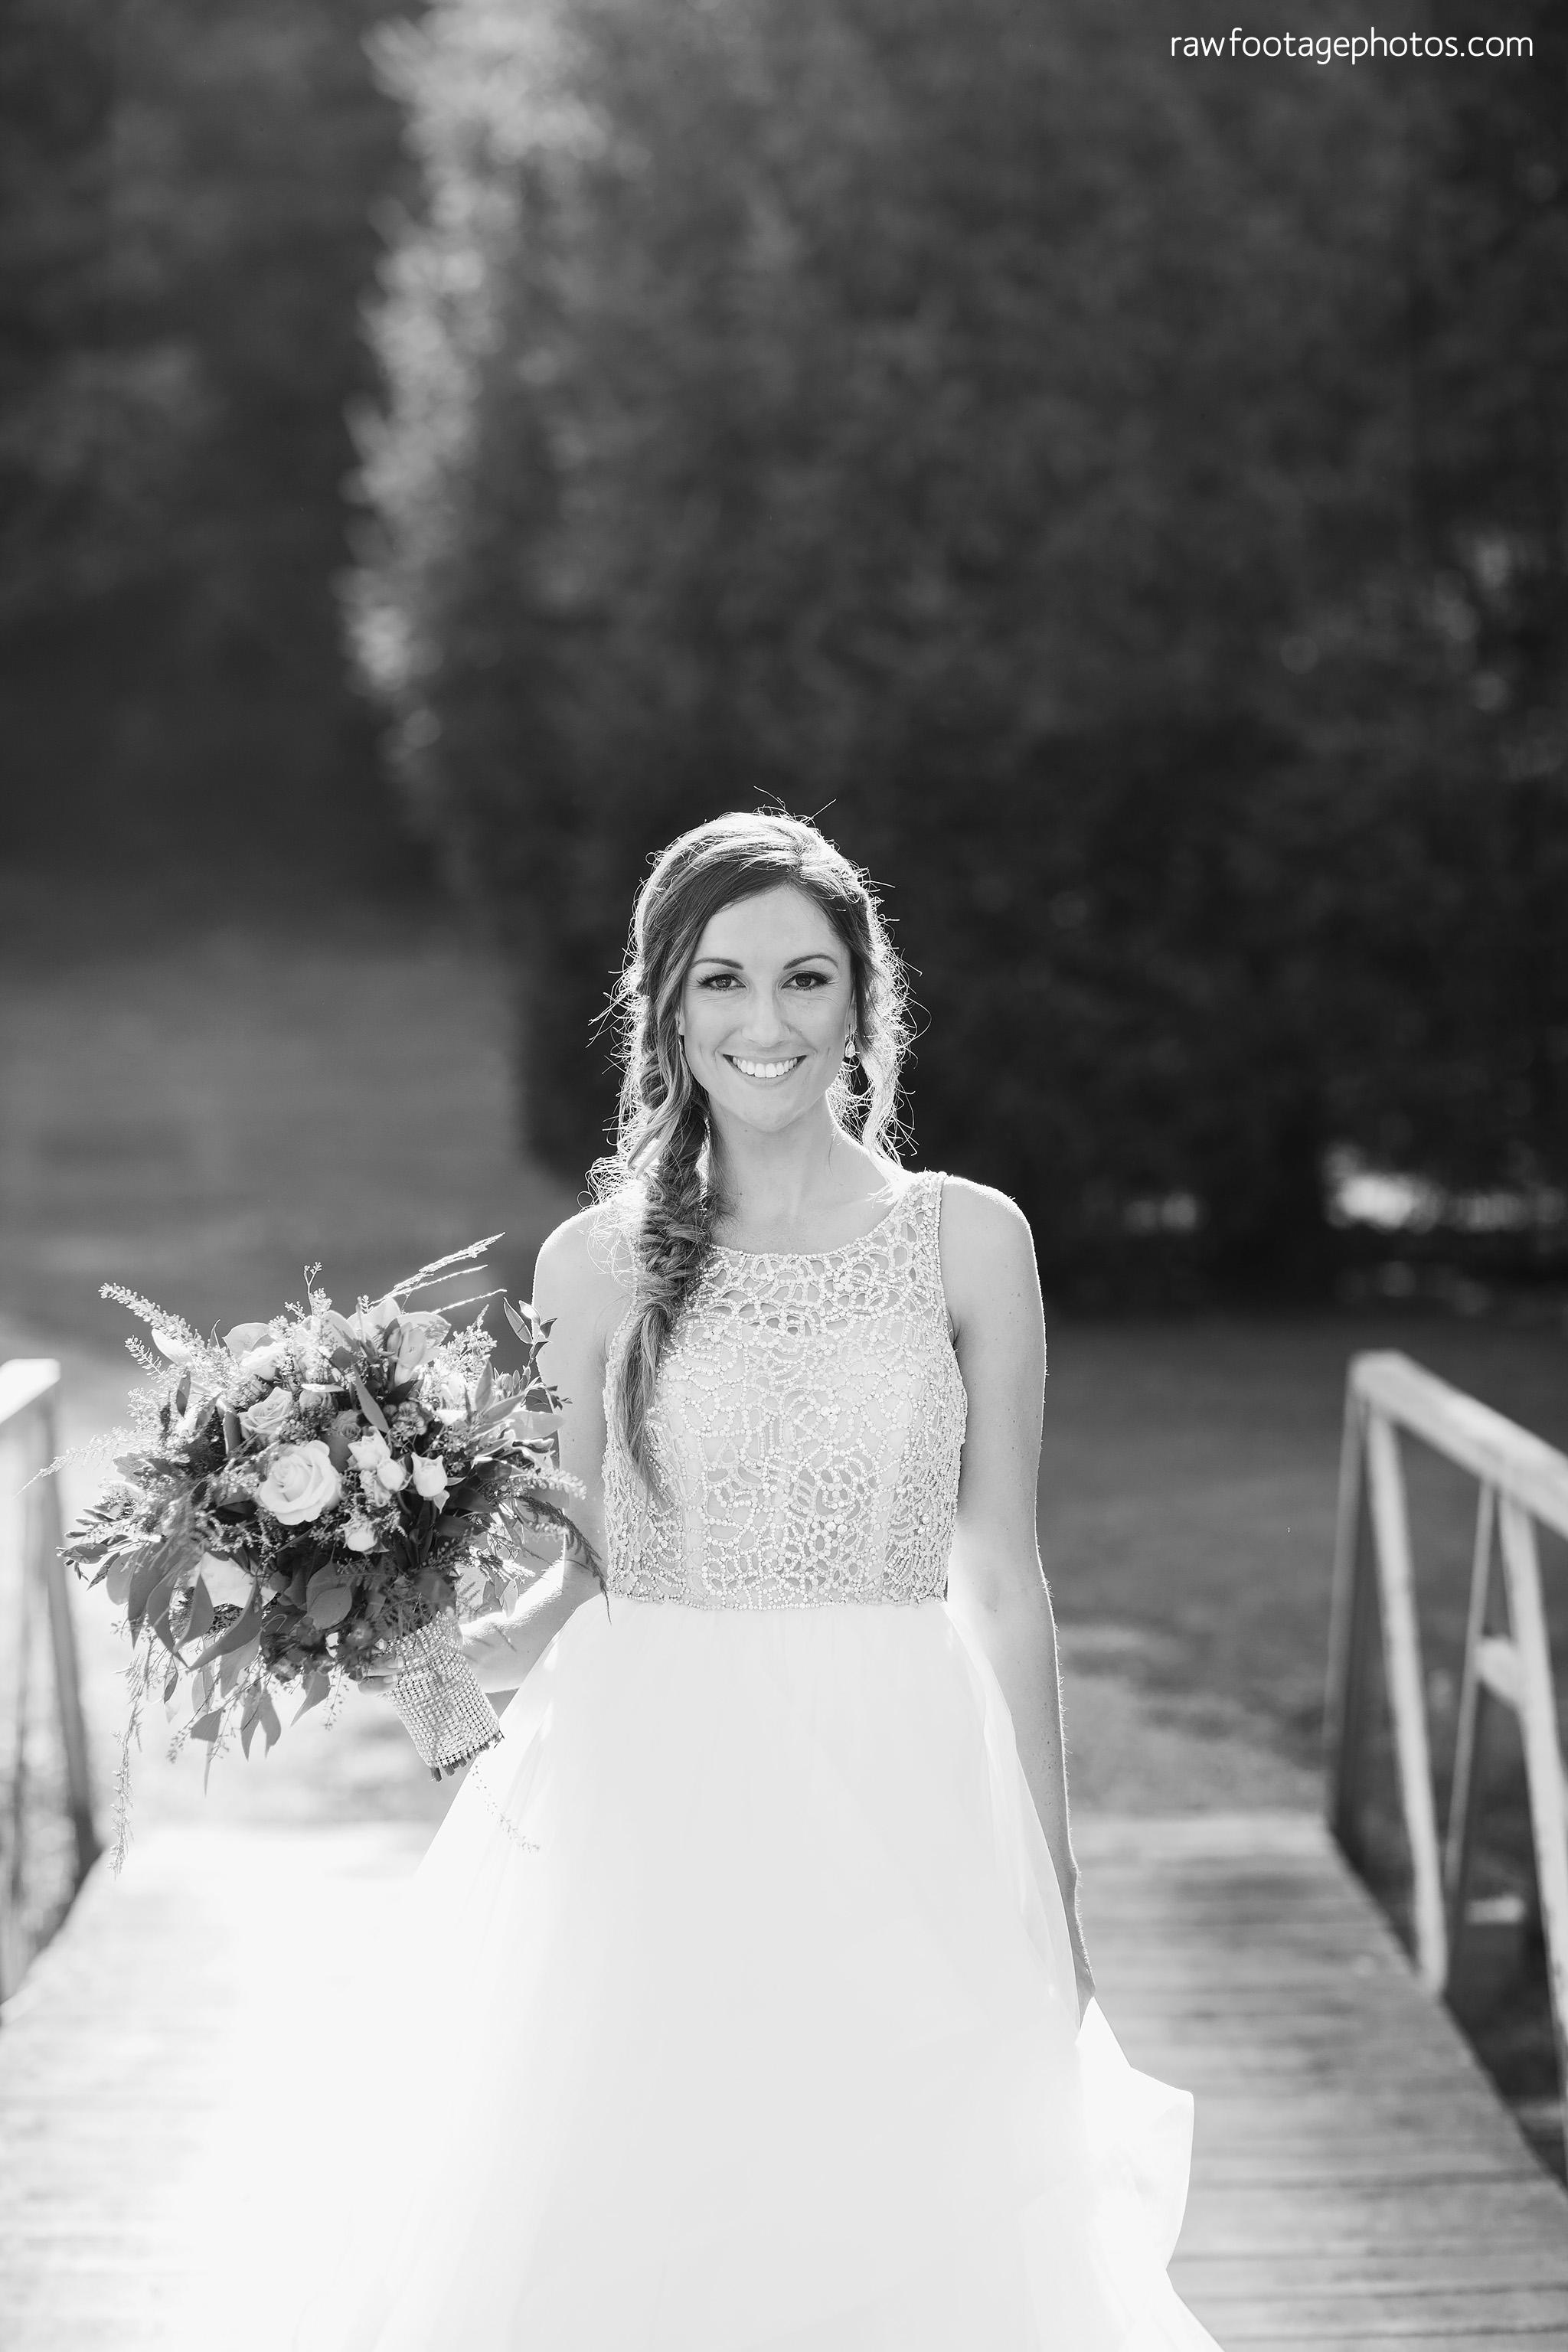 london_ontario_wedding_photographer-grand_bend_wedding_photographer-oakwood_resort_wedding-beach_wedding-sunset_wedding-raw_footage_photography051.jpg